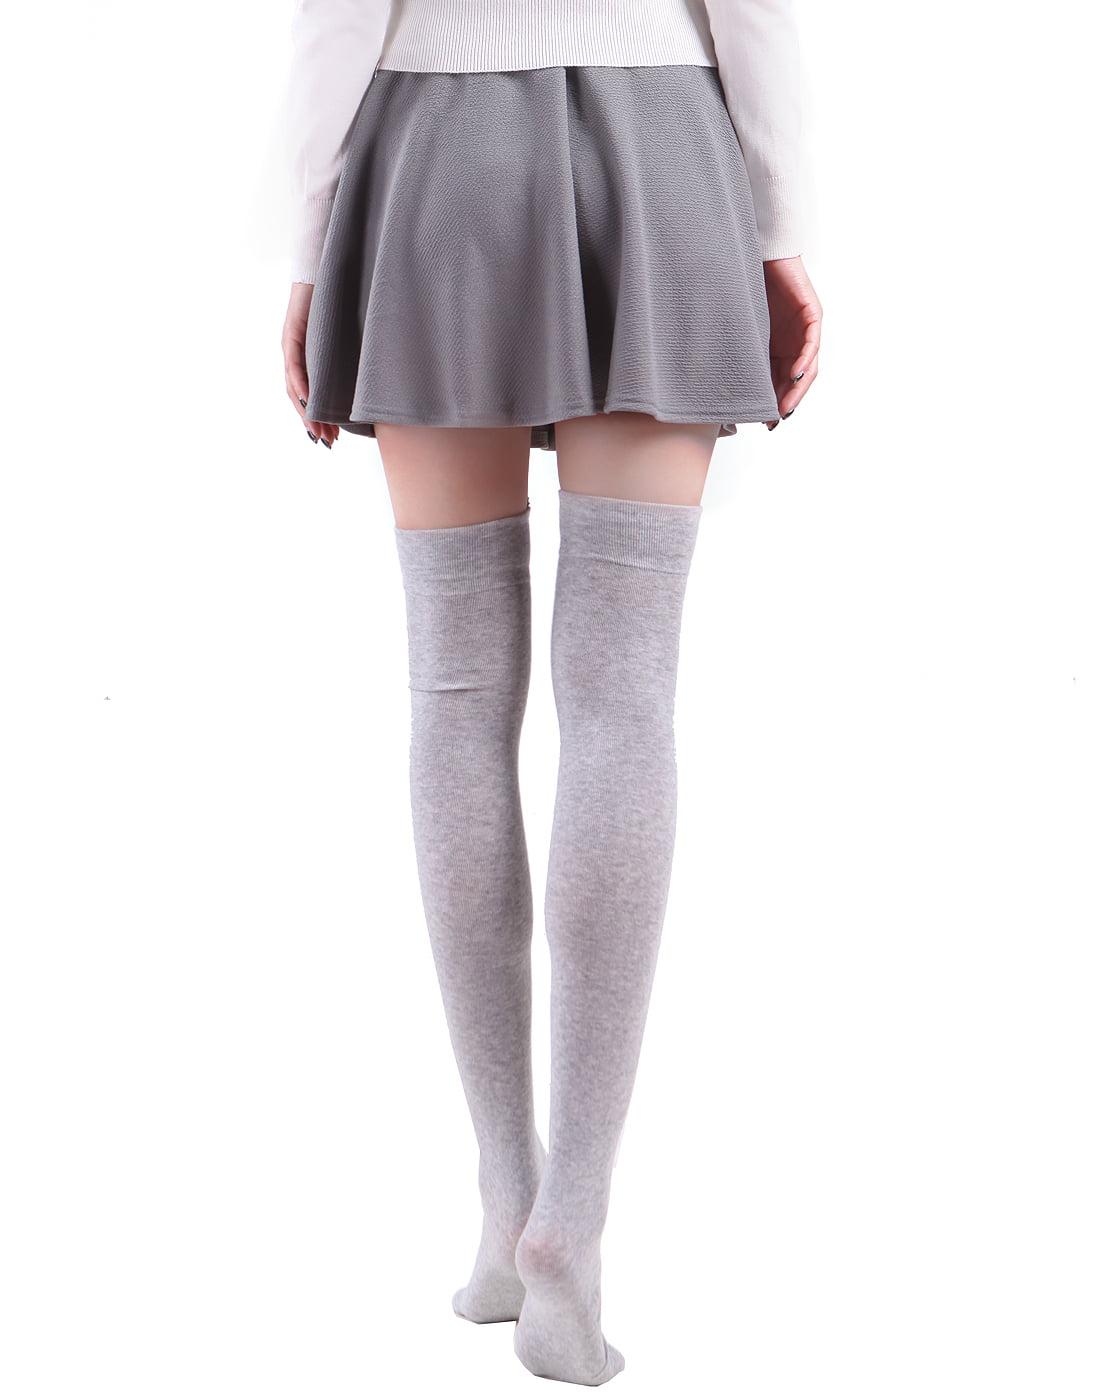 8047ea0c2 HDE Women's Animal Over Knee Thigh High Socks Stockings with Ears (Gray  Bear)